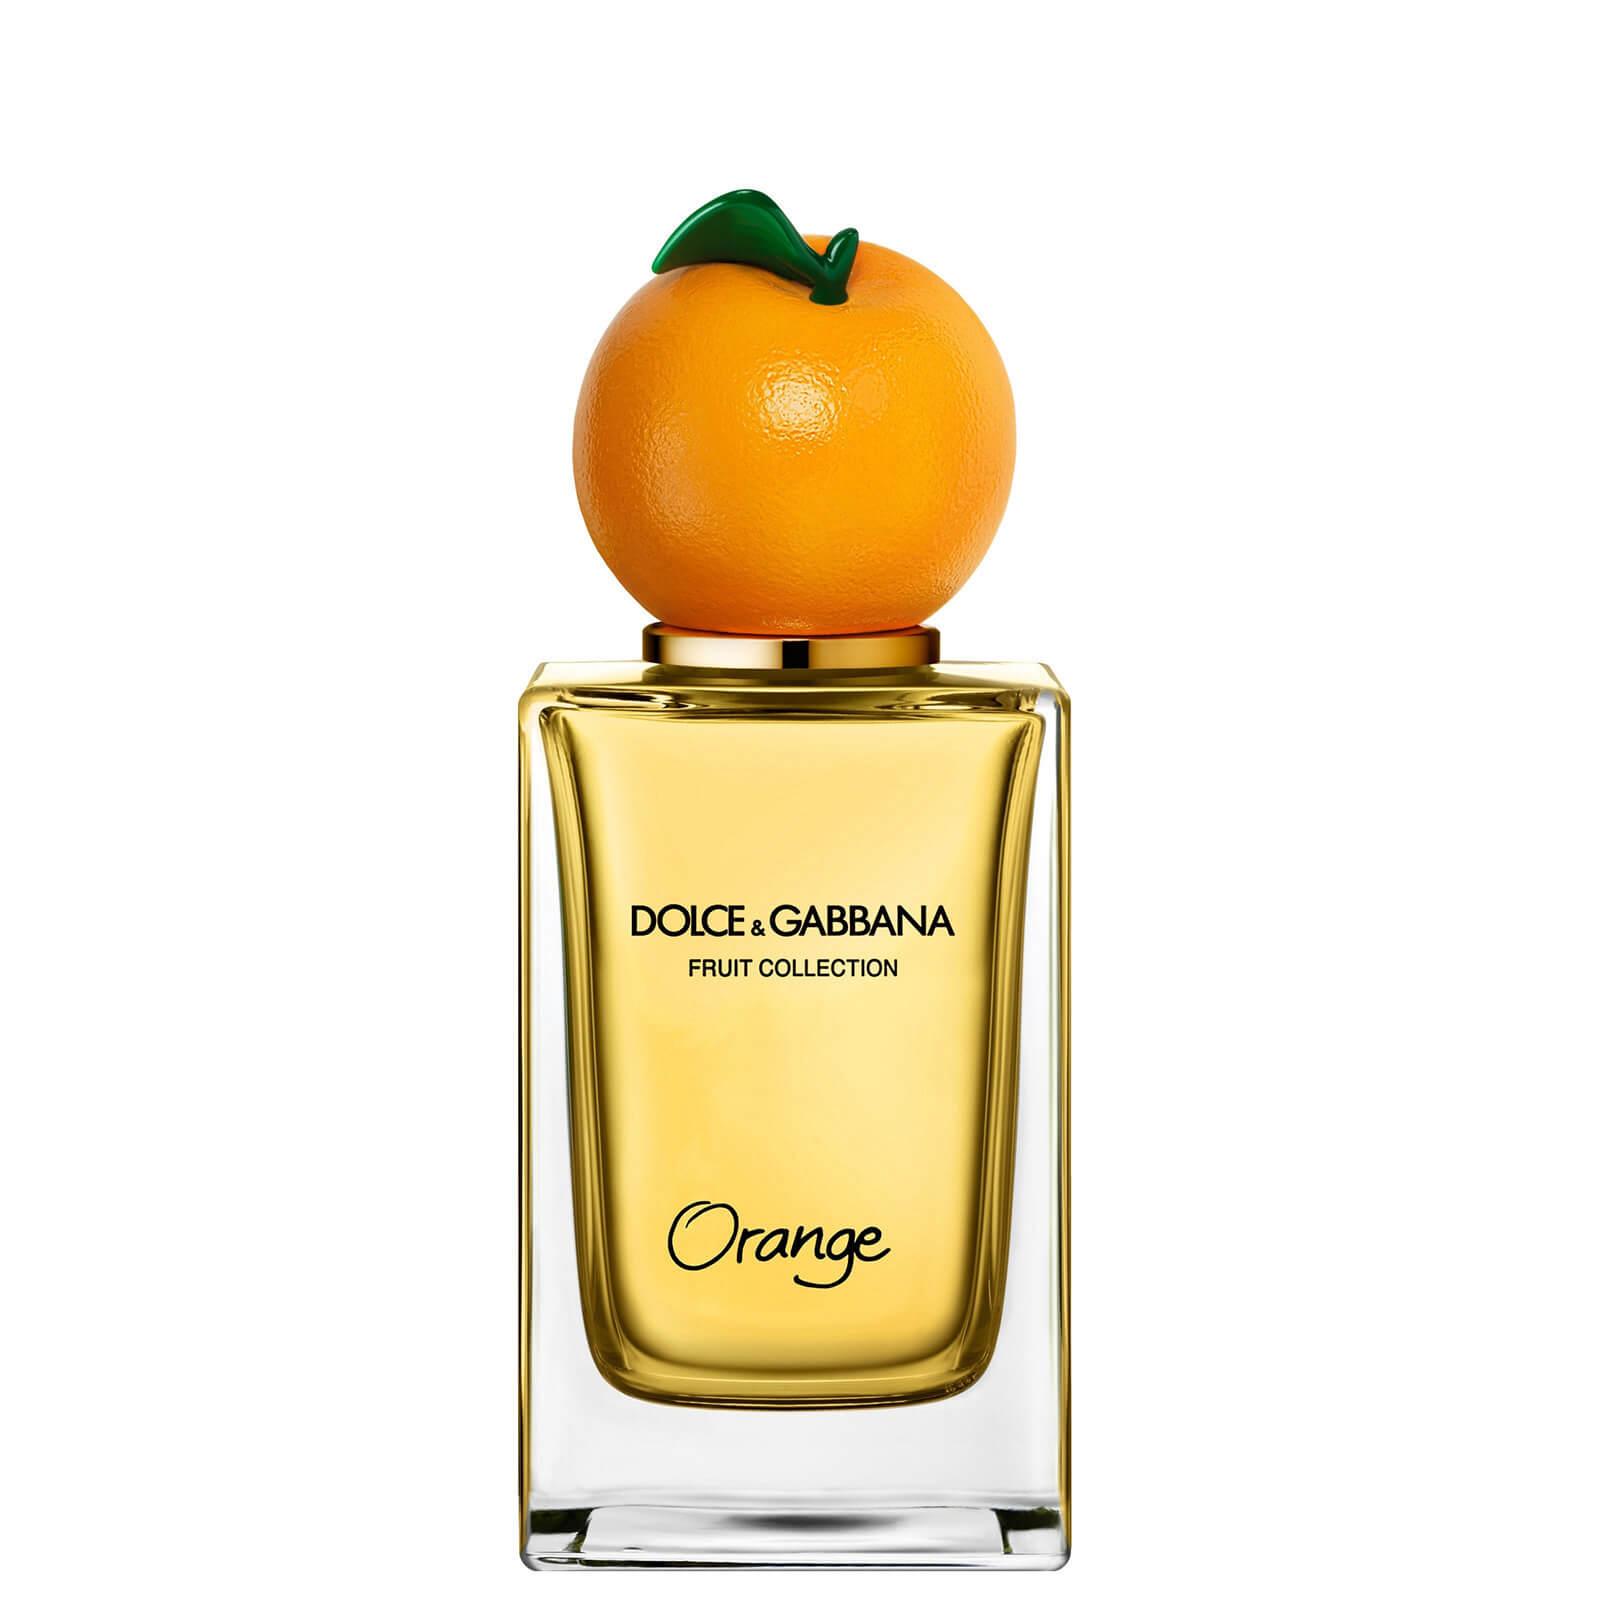 Купить Dolce&Gabbana Fruit Collection Orange Eau de Toilette 150ml